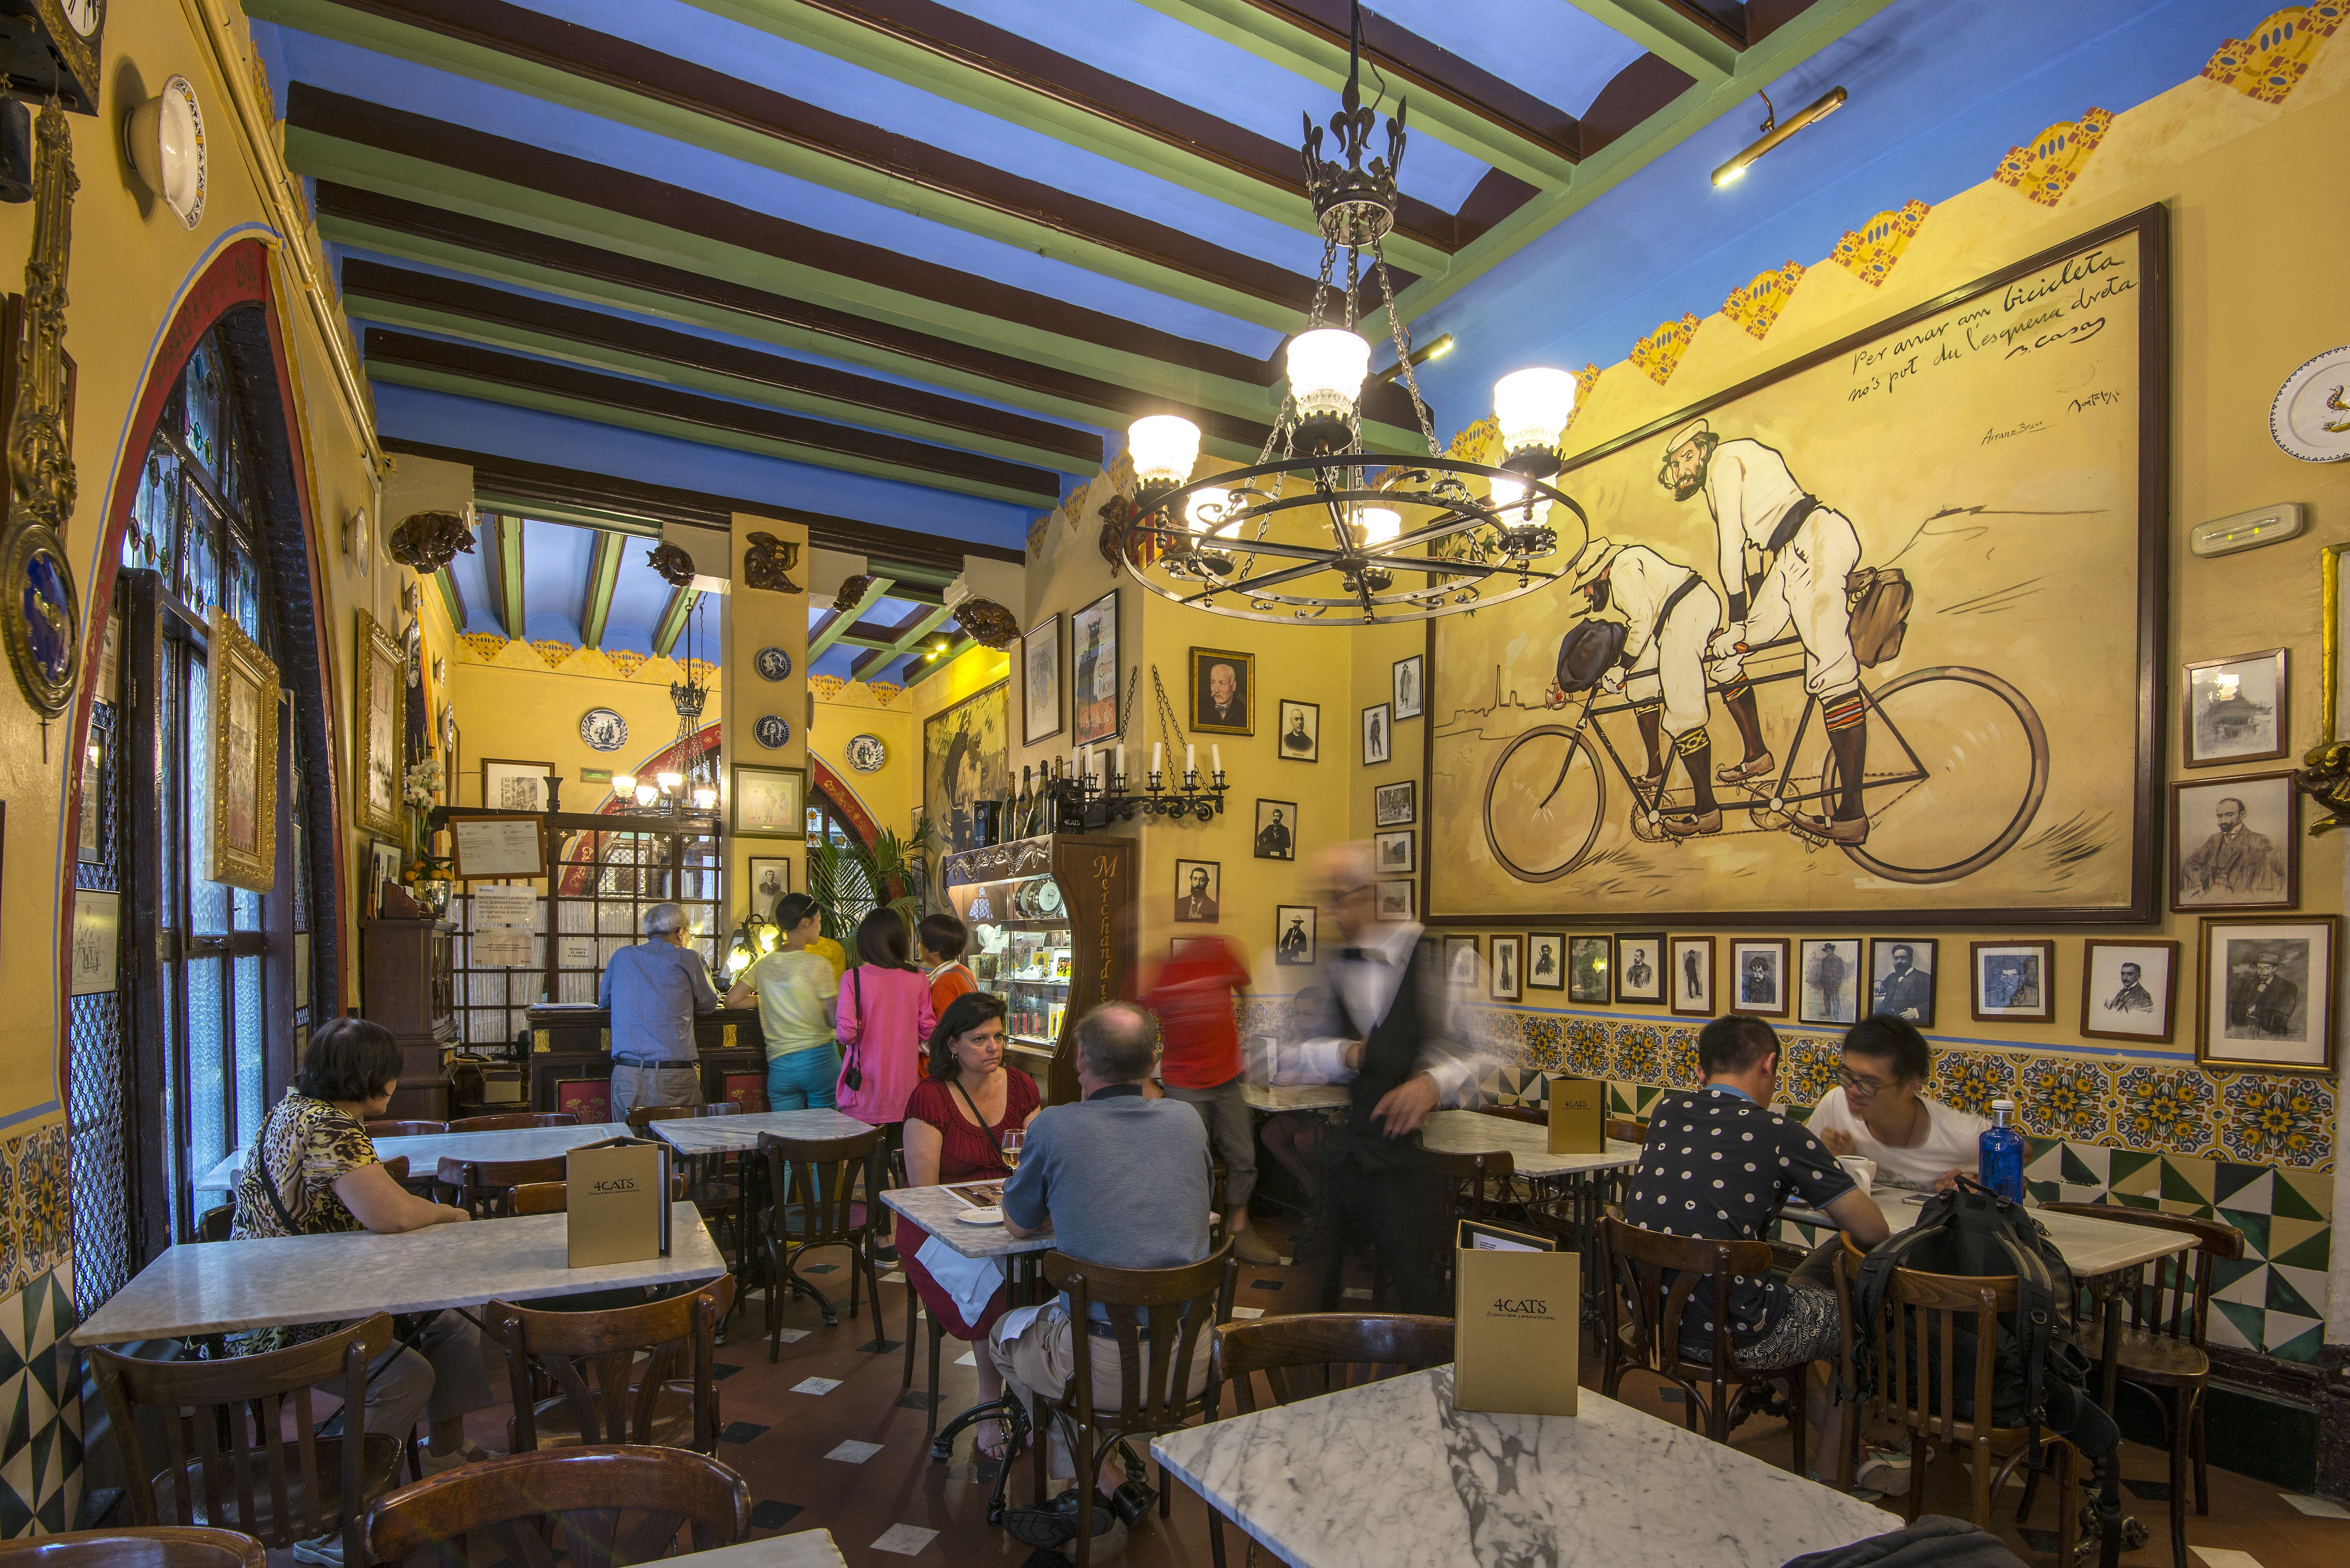 The Els Quatre Gats historical cafe restaurant, Barcelona, Catalonia, Spain